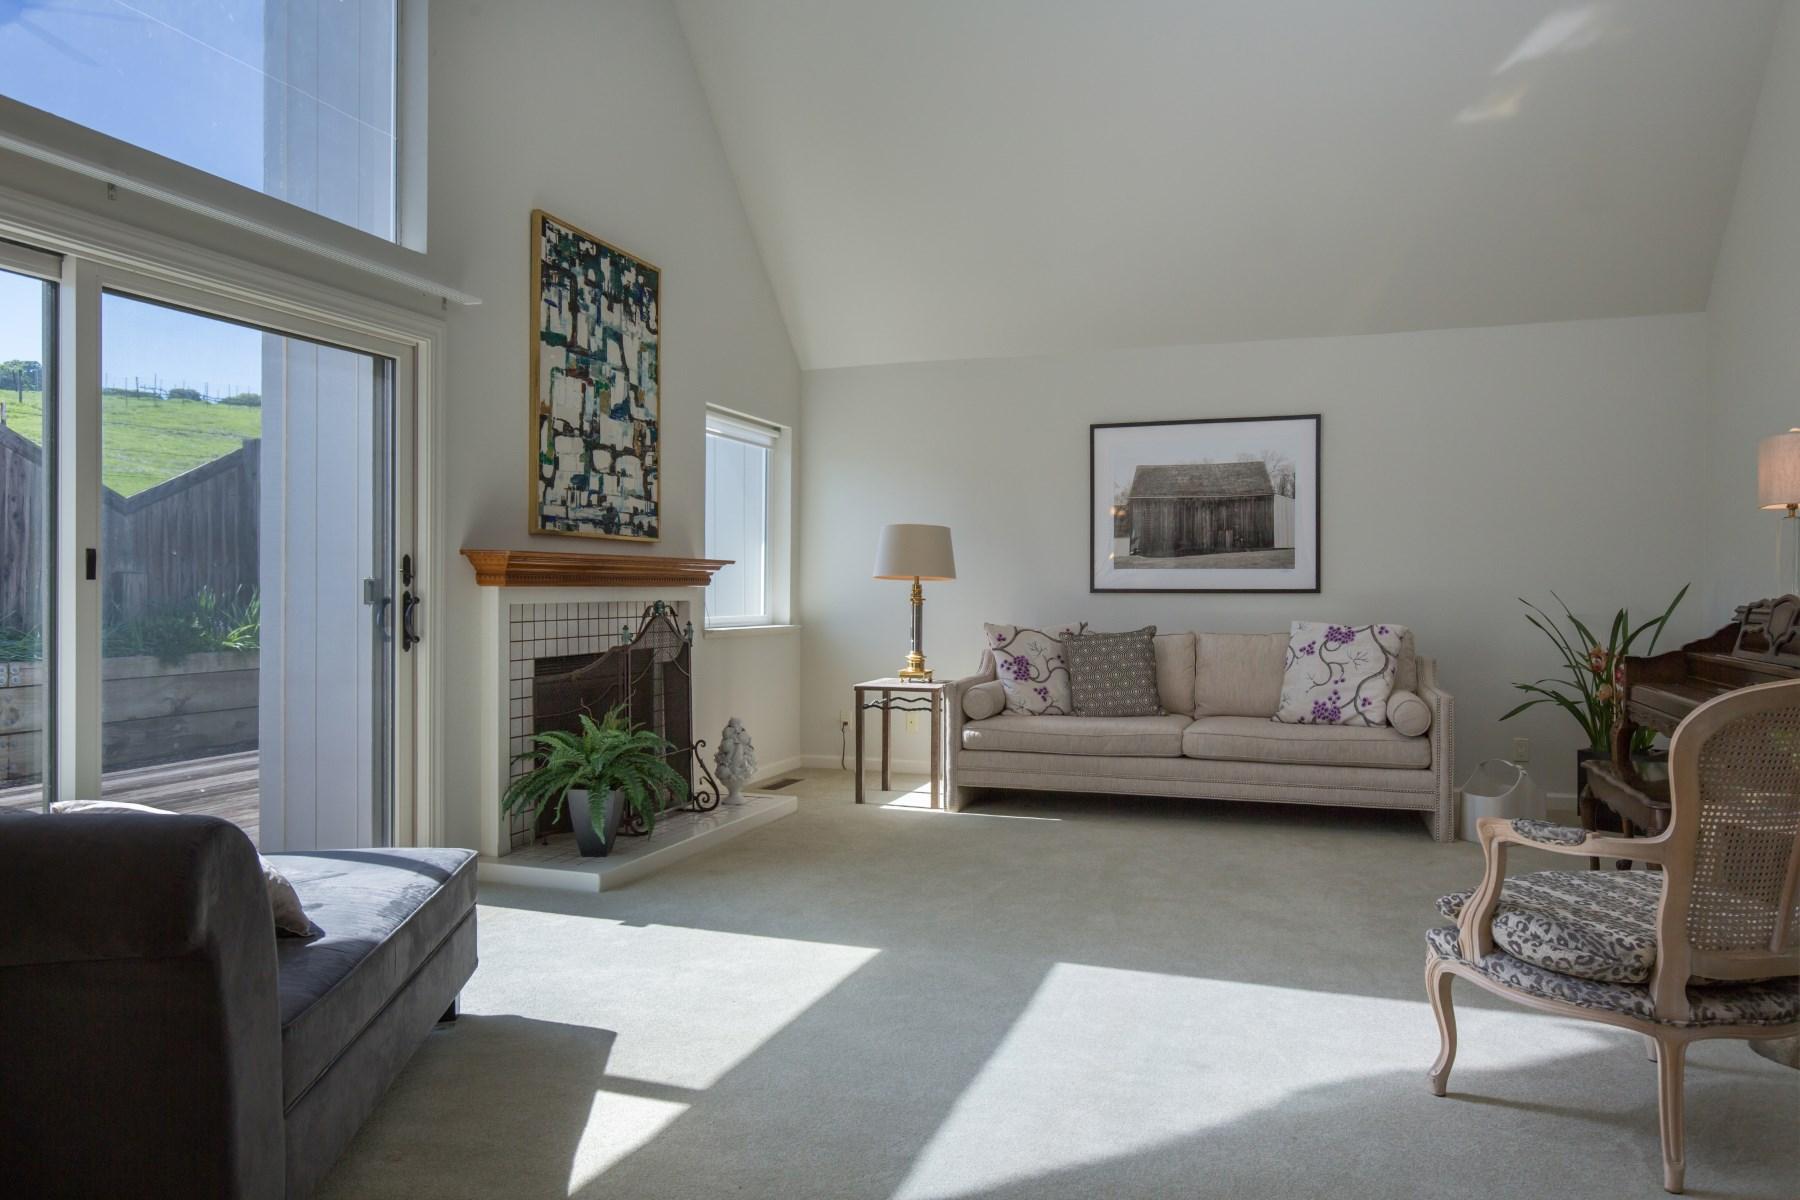 Single Family Home for Sale at Sweeping Views 717 Lobelia Ct Sonoma, California, 95476 United States